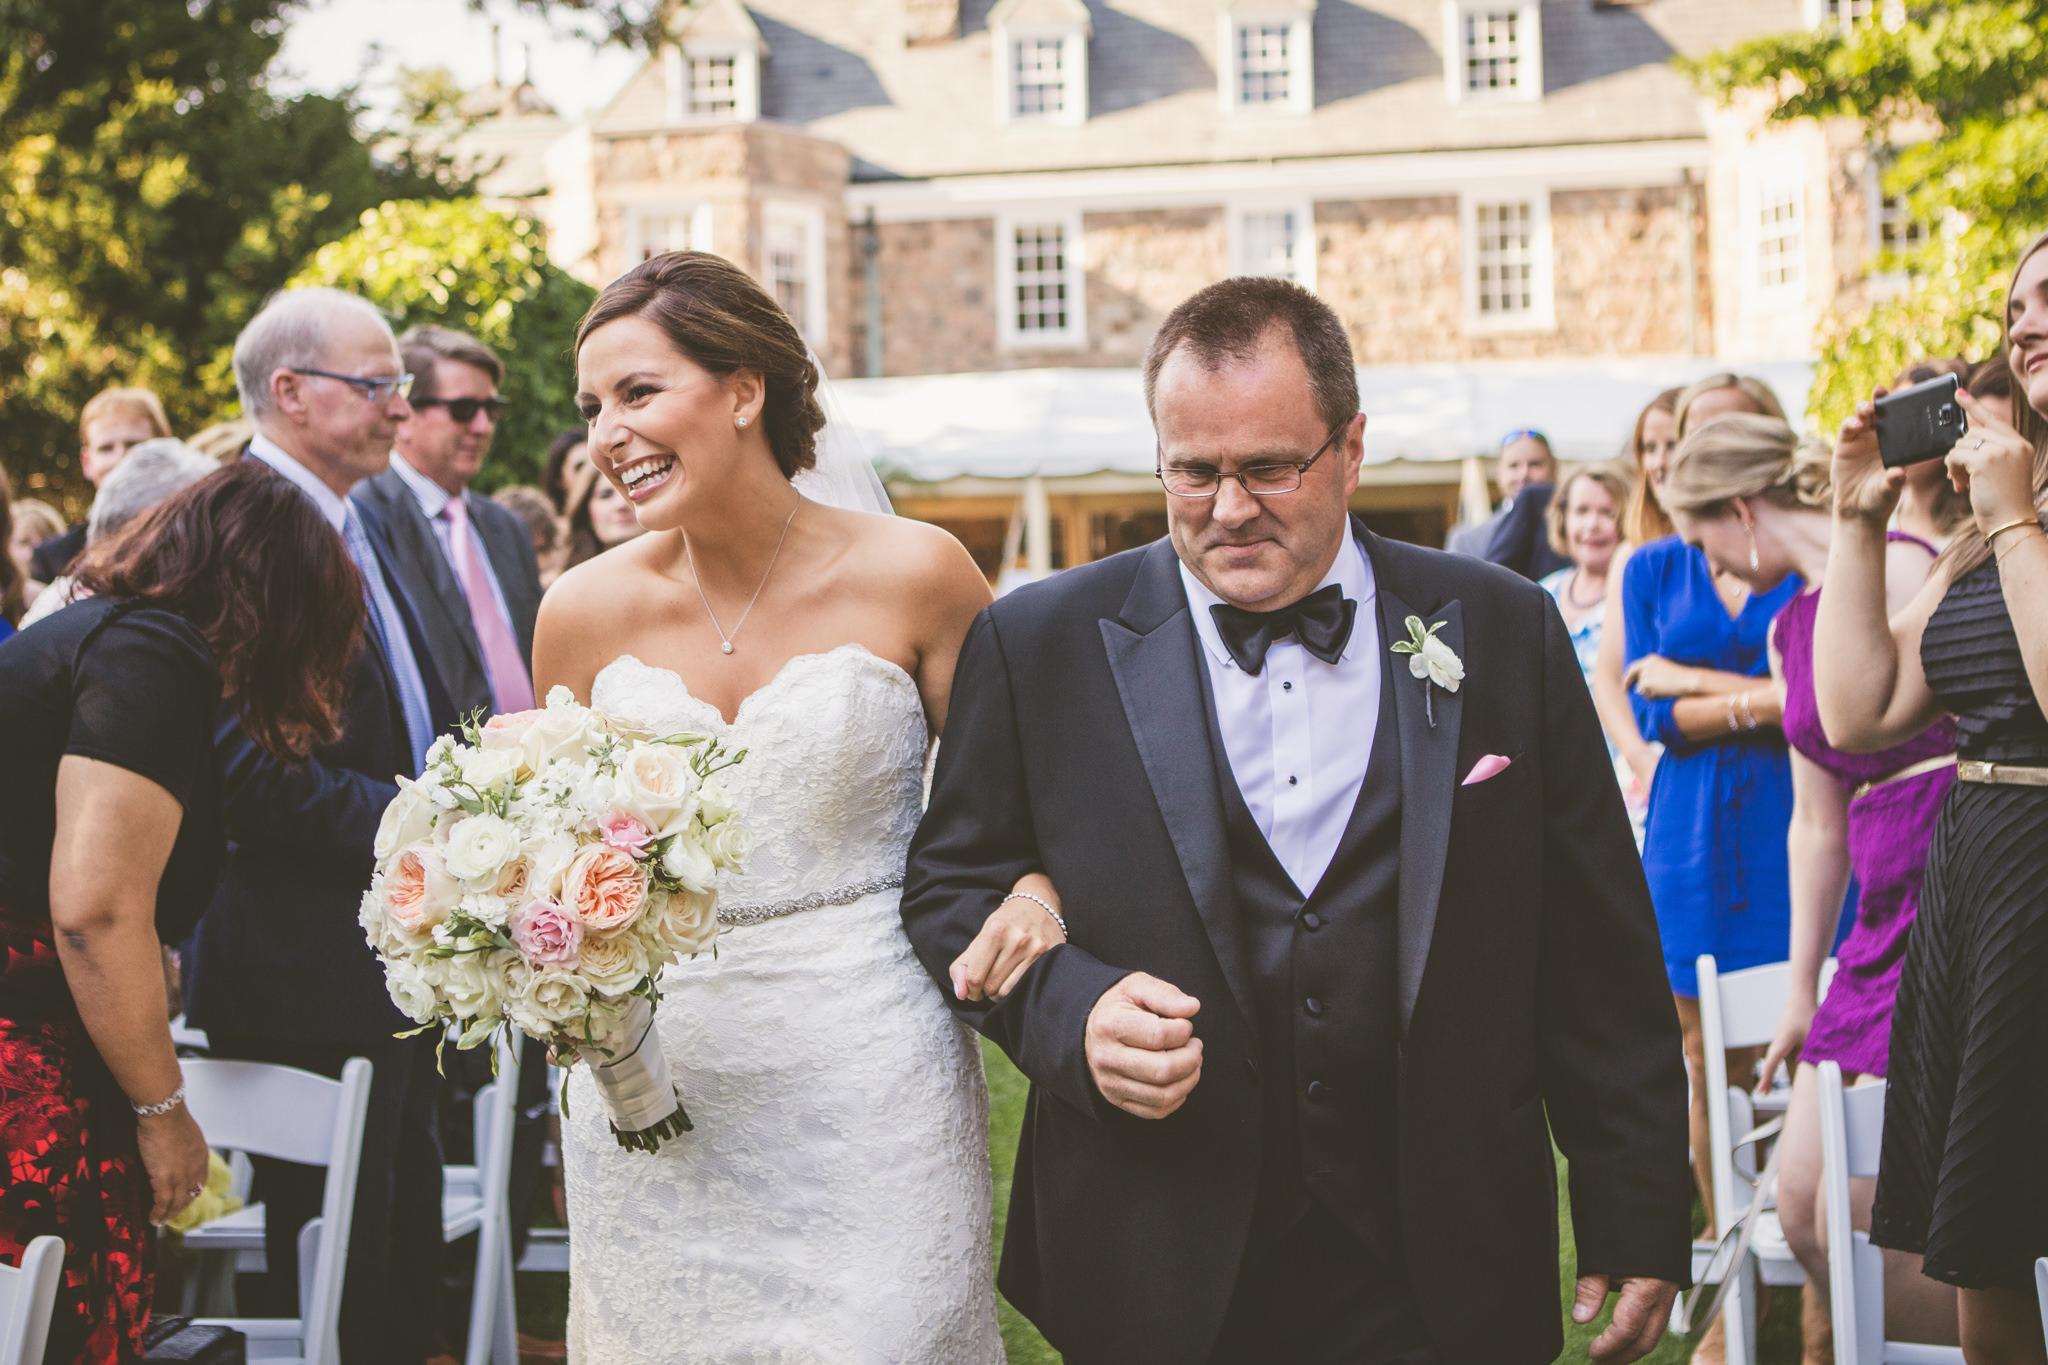 mclean house wedding photos 332 - McLean House Wedding Part 1